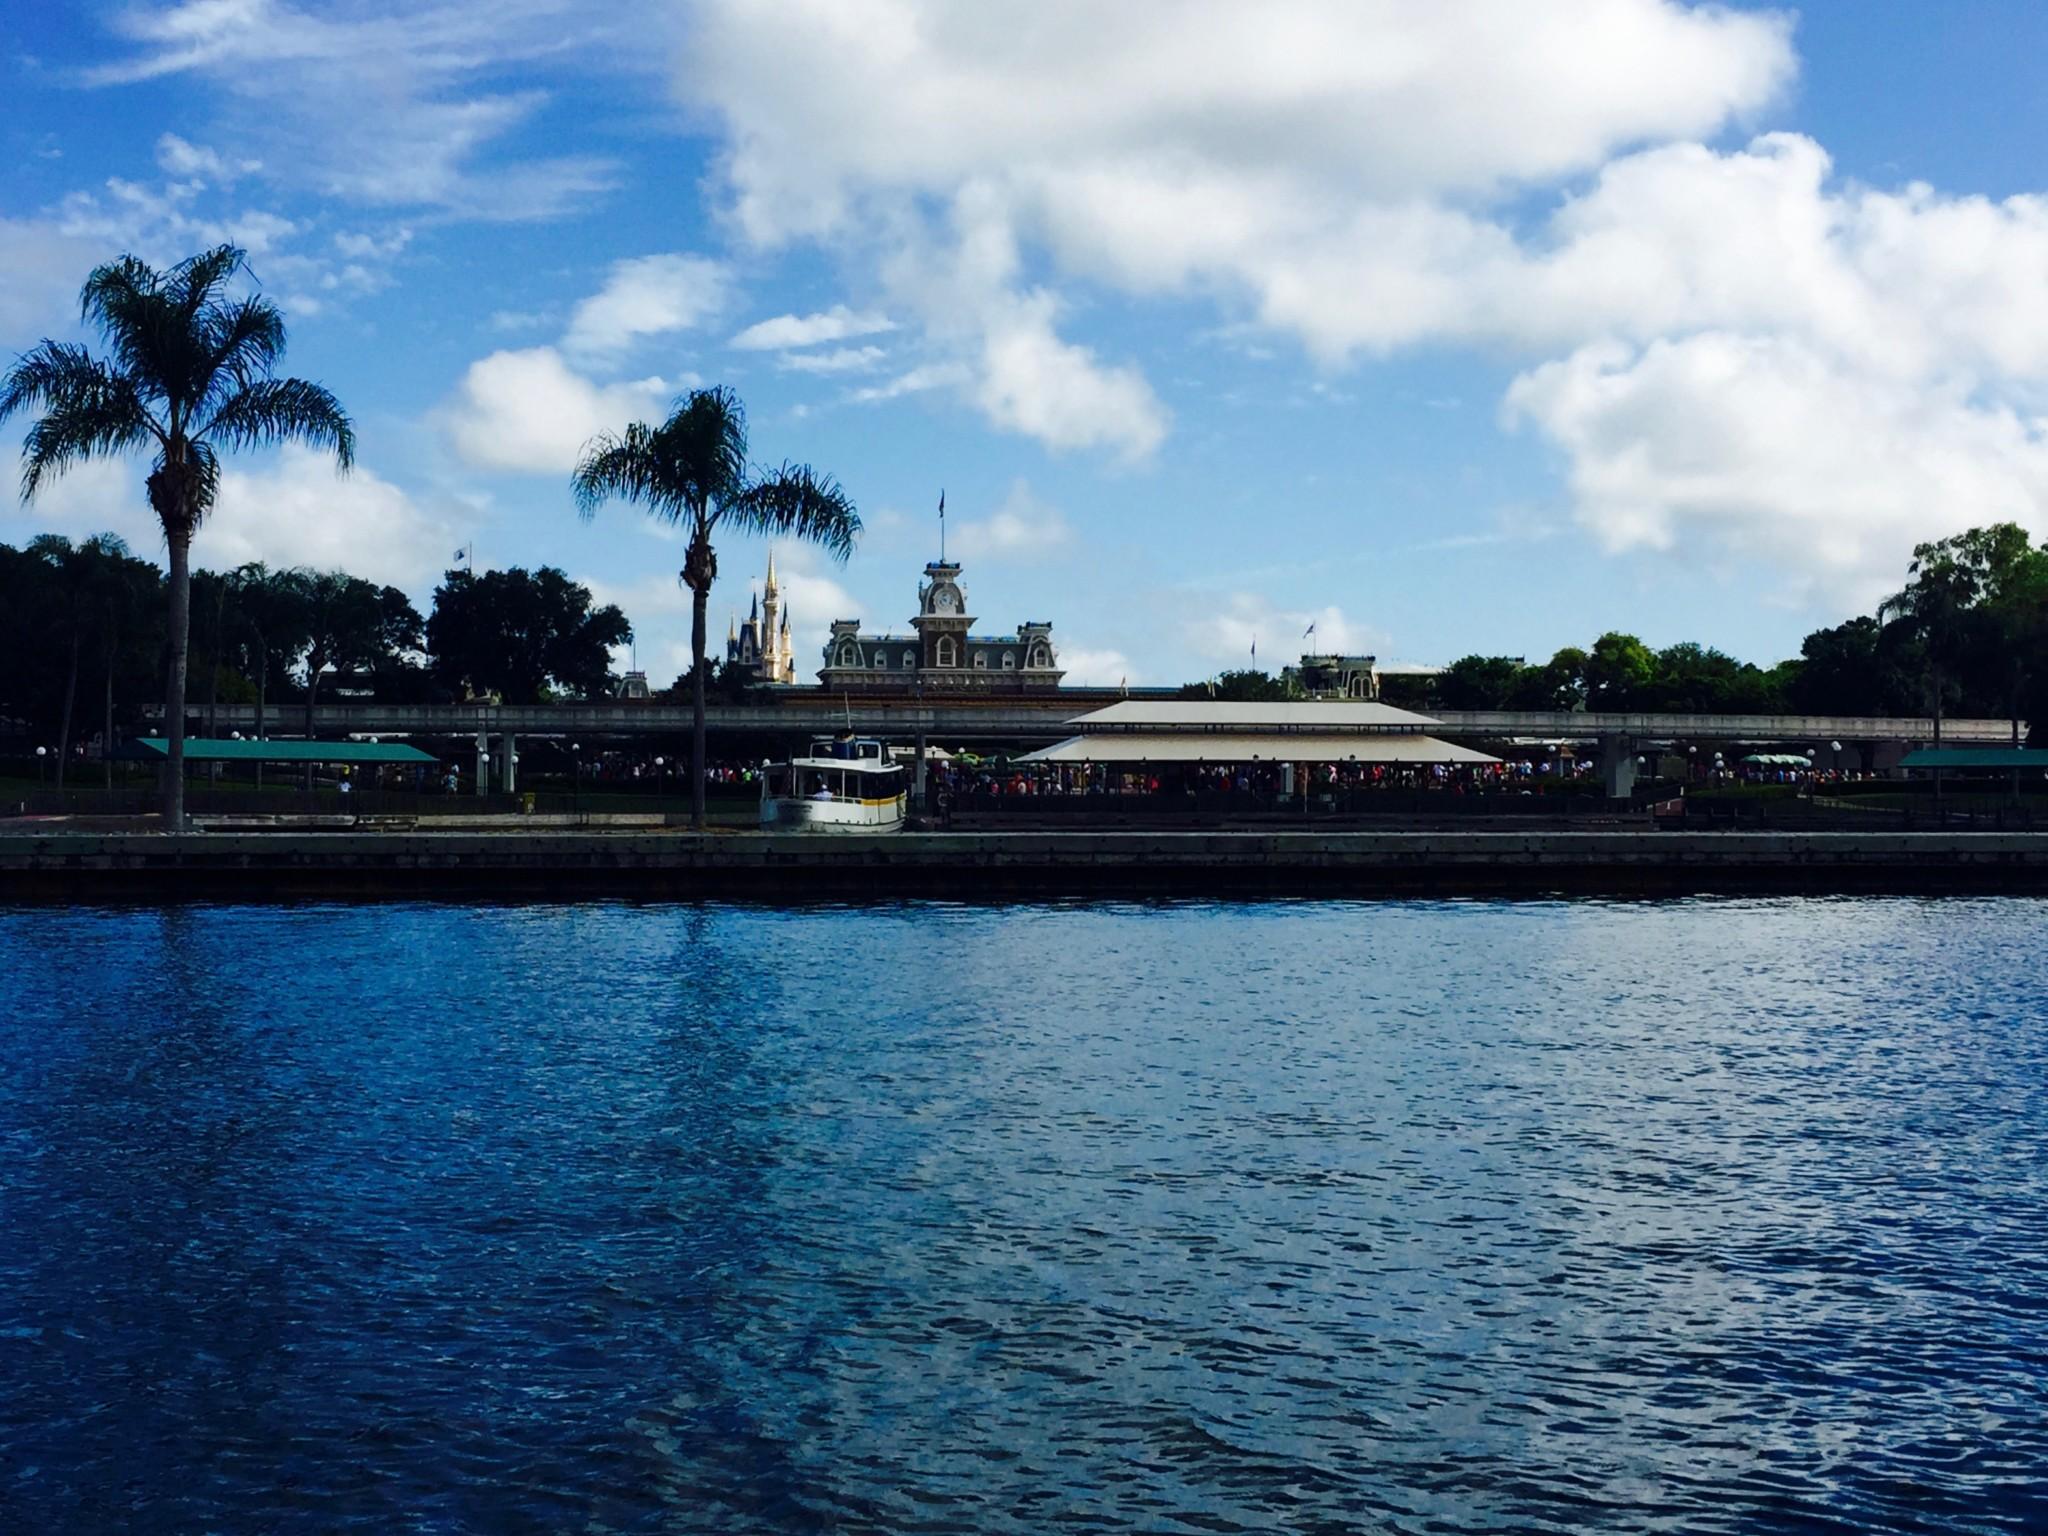 Boat Ride to Magic Kingdom